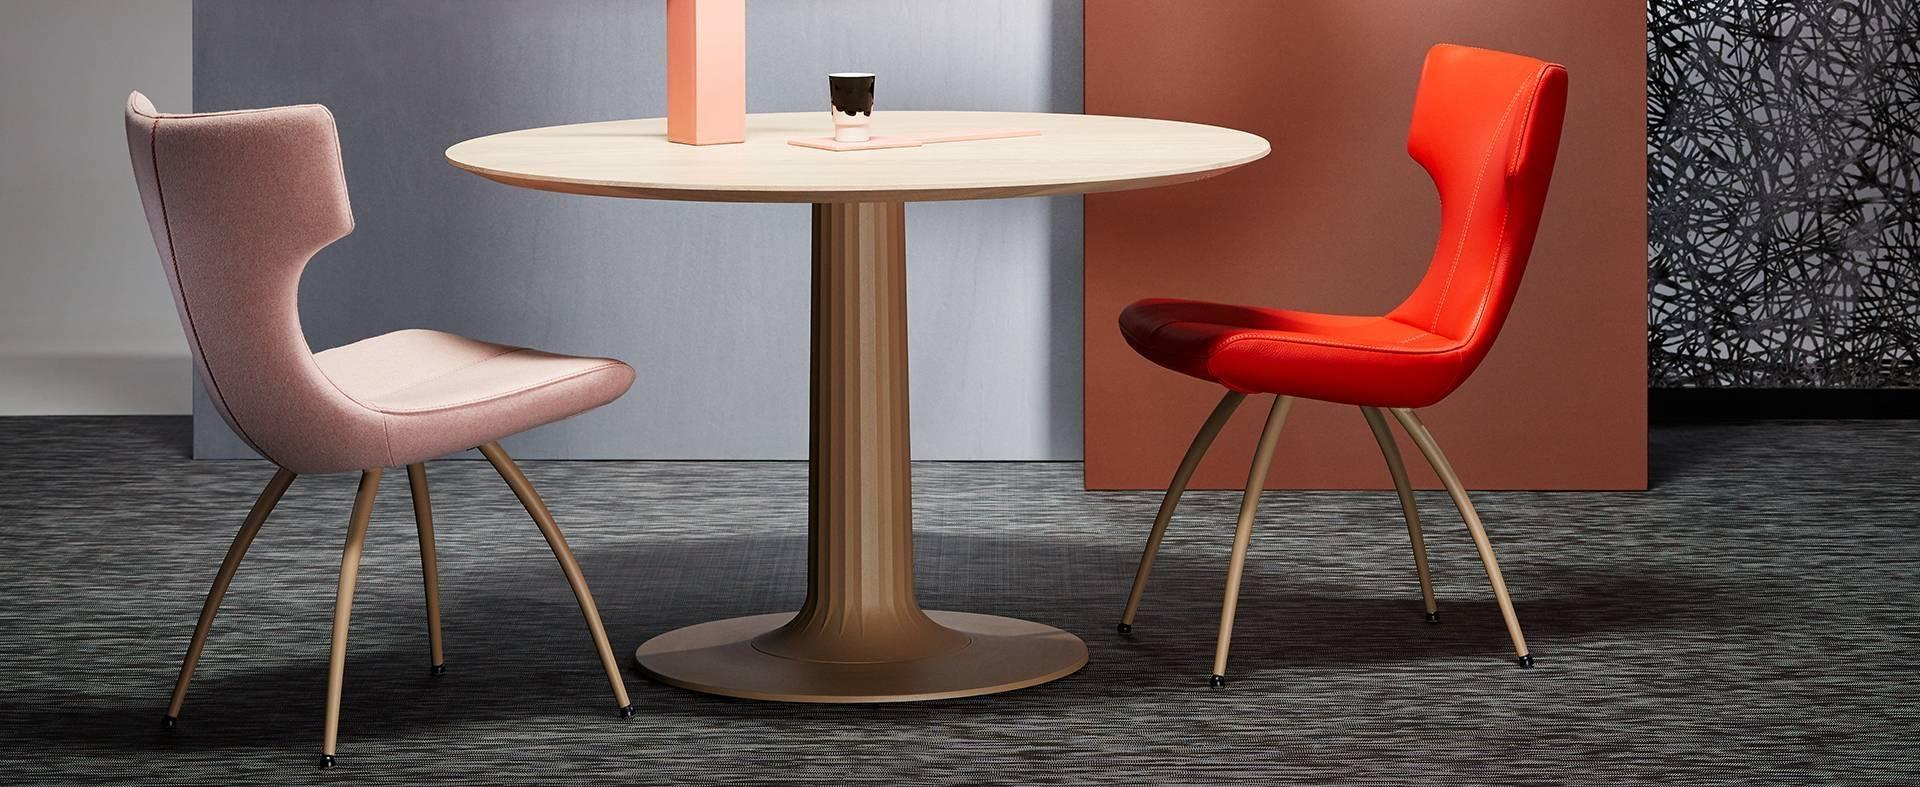 leolux-design-eetkamerstoel-callas